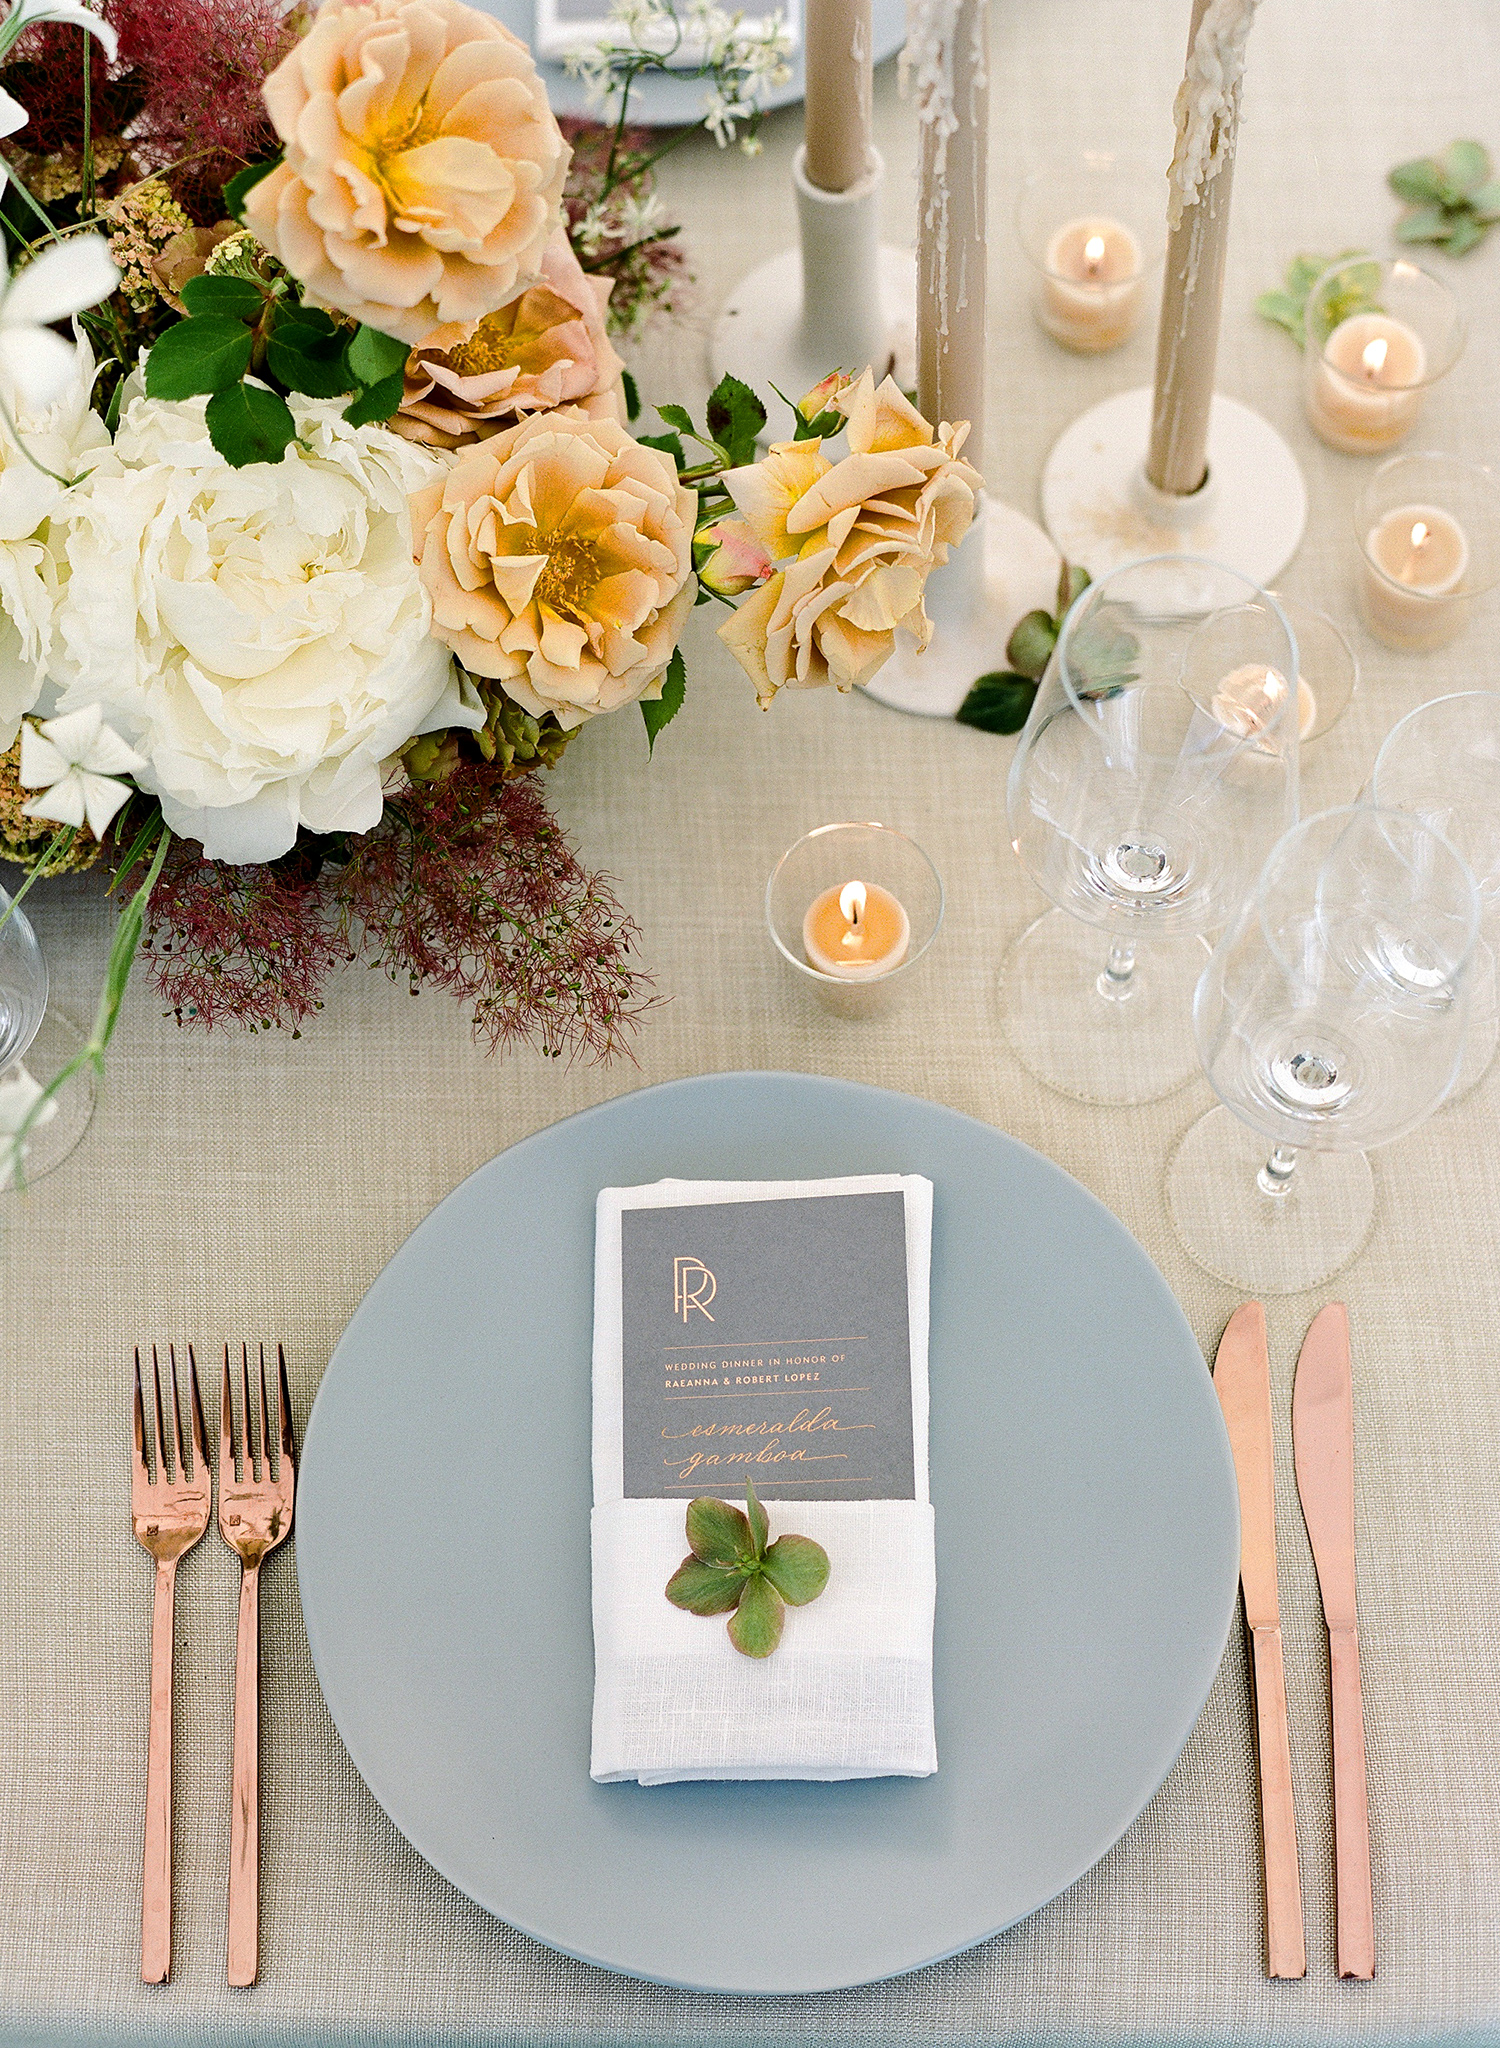 rae rob wedding table place setting